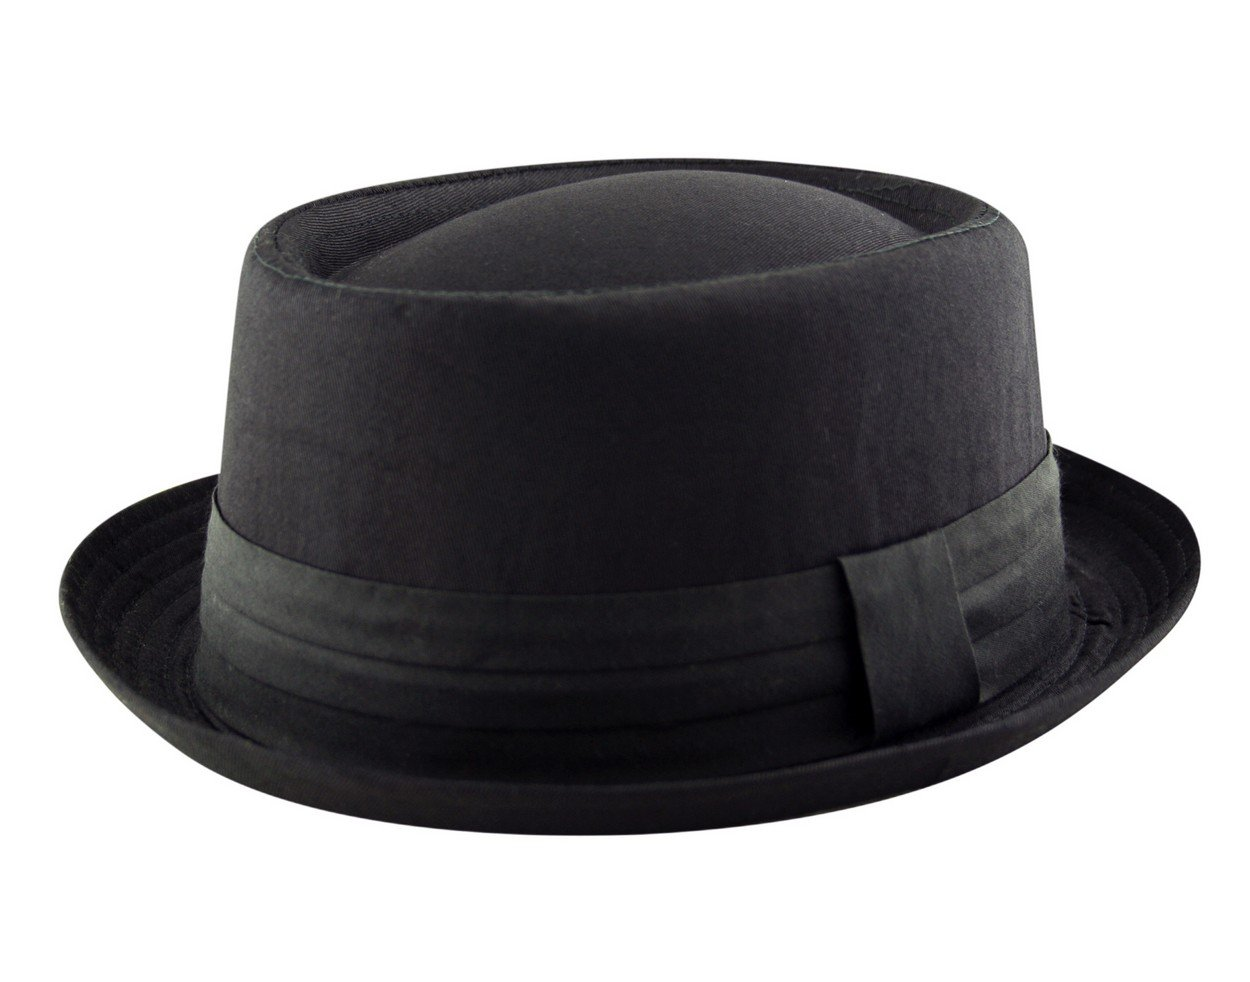 e8ce448b70 Best Rated in Men's Porkpie Hats & Helpful Customer Reviews - Amazon ...